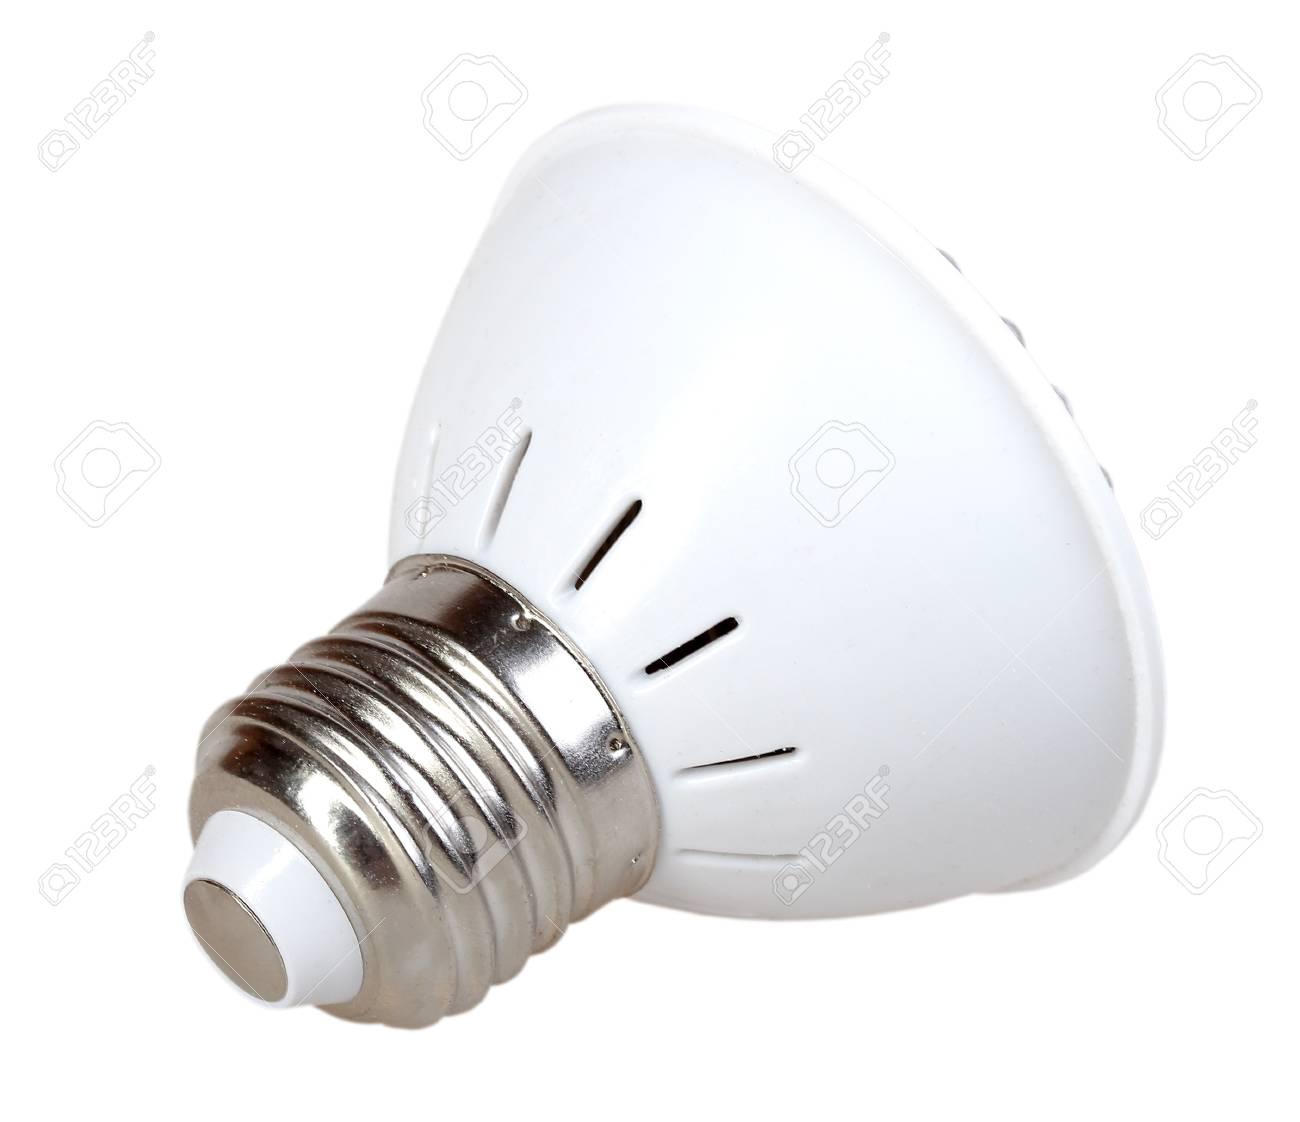 Cone energy-saving LED lamp isolated on white background. Back view. Studio photography. Stock Photo - 18626204